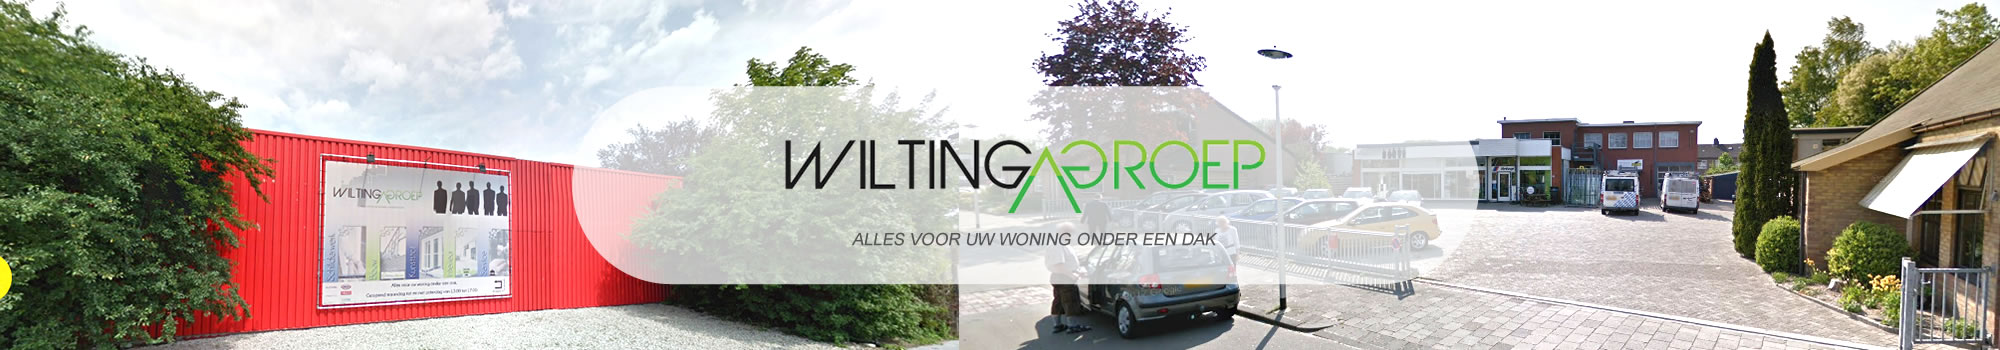 bouwbedrijf_wilting_groep_veendam_allround_aannemer-veendam